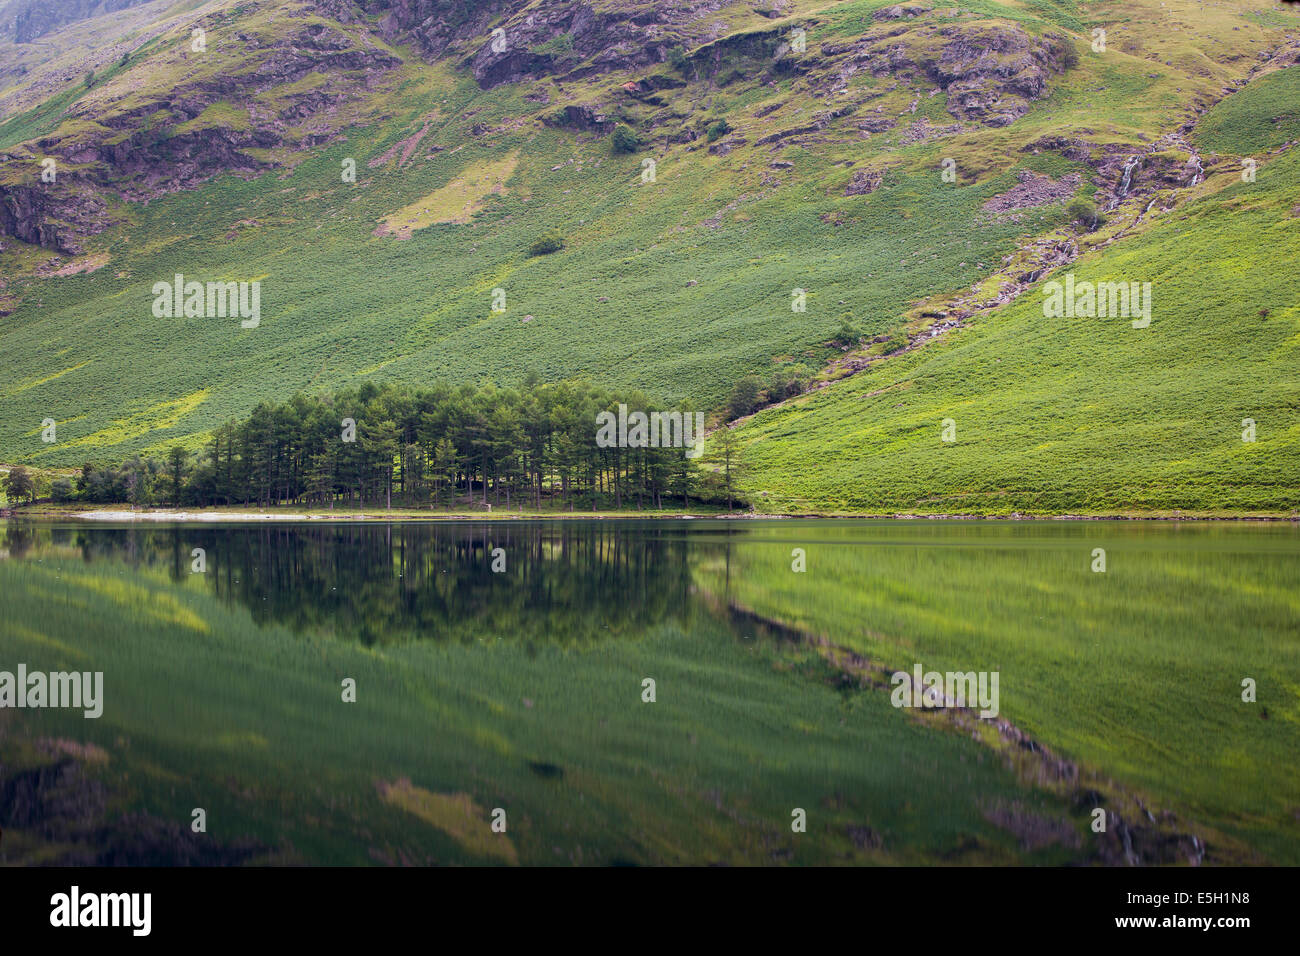 Reflexiones previas al amanecer sobre el lago Buttermere, Cumbria, Lake District, Inglaterra Foto de stock